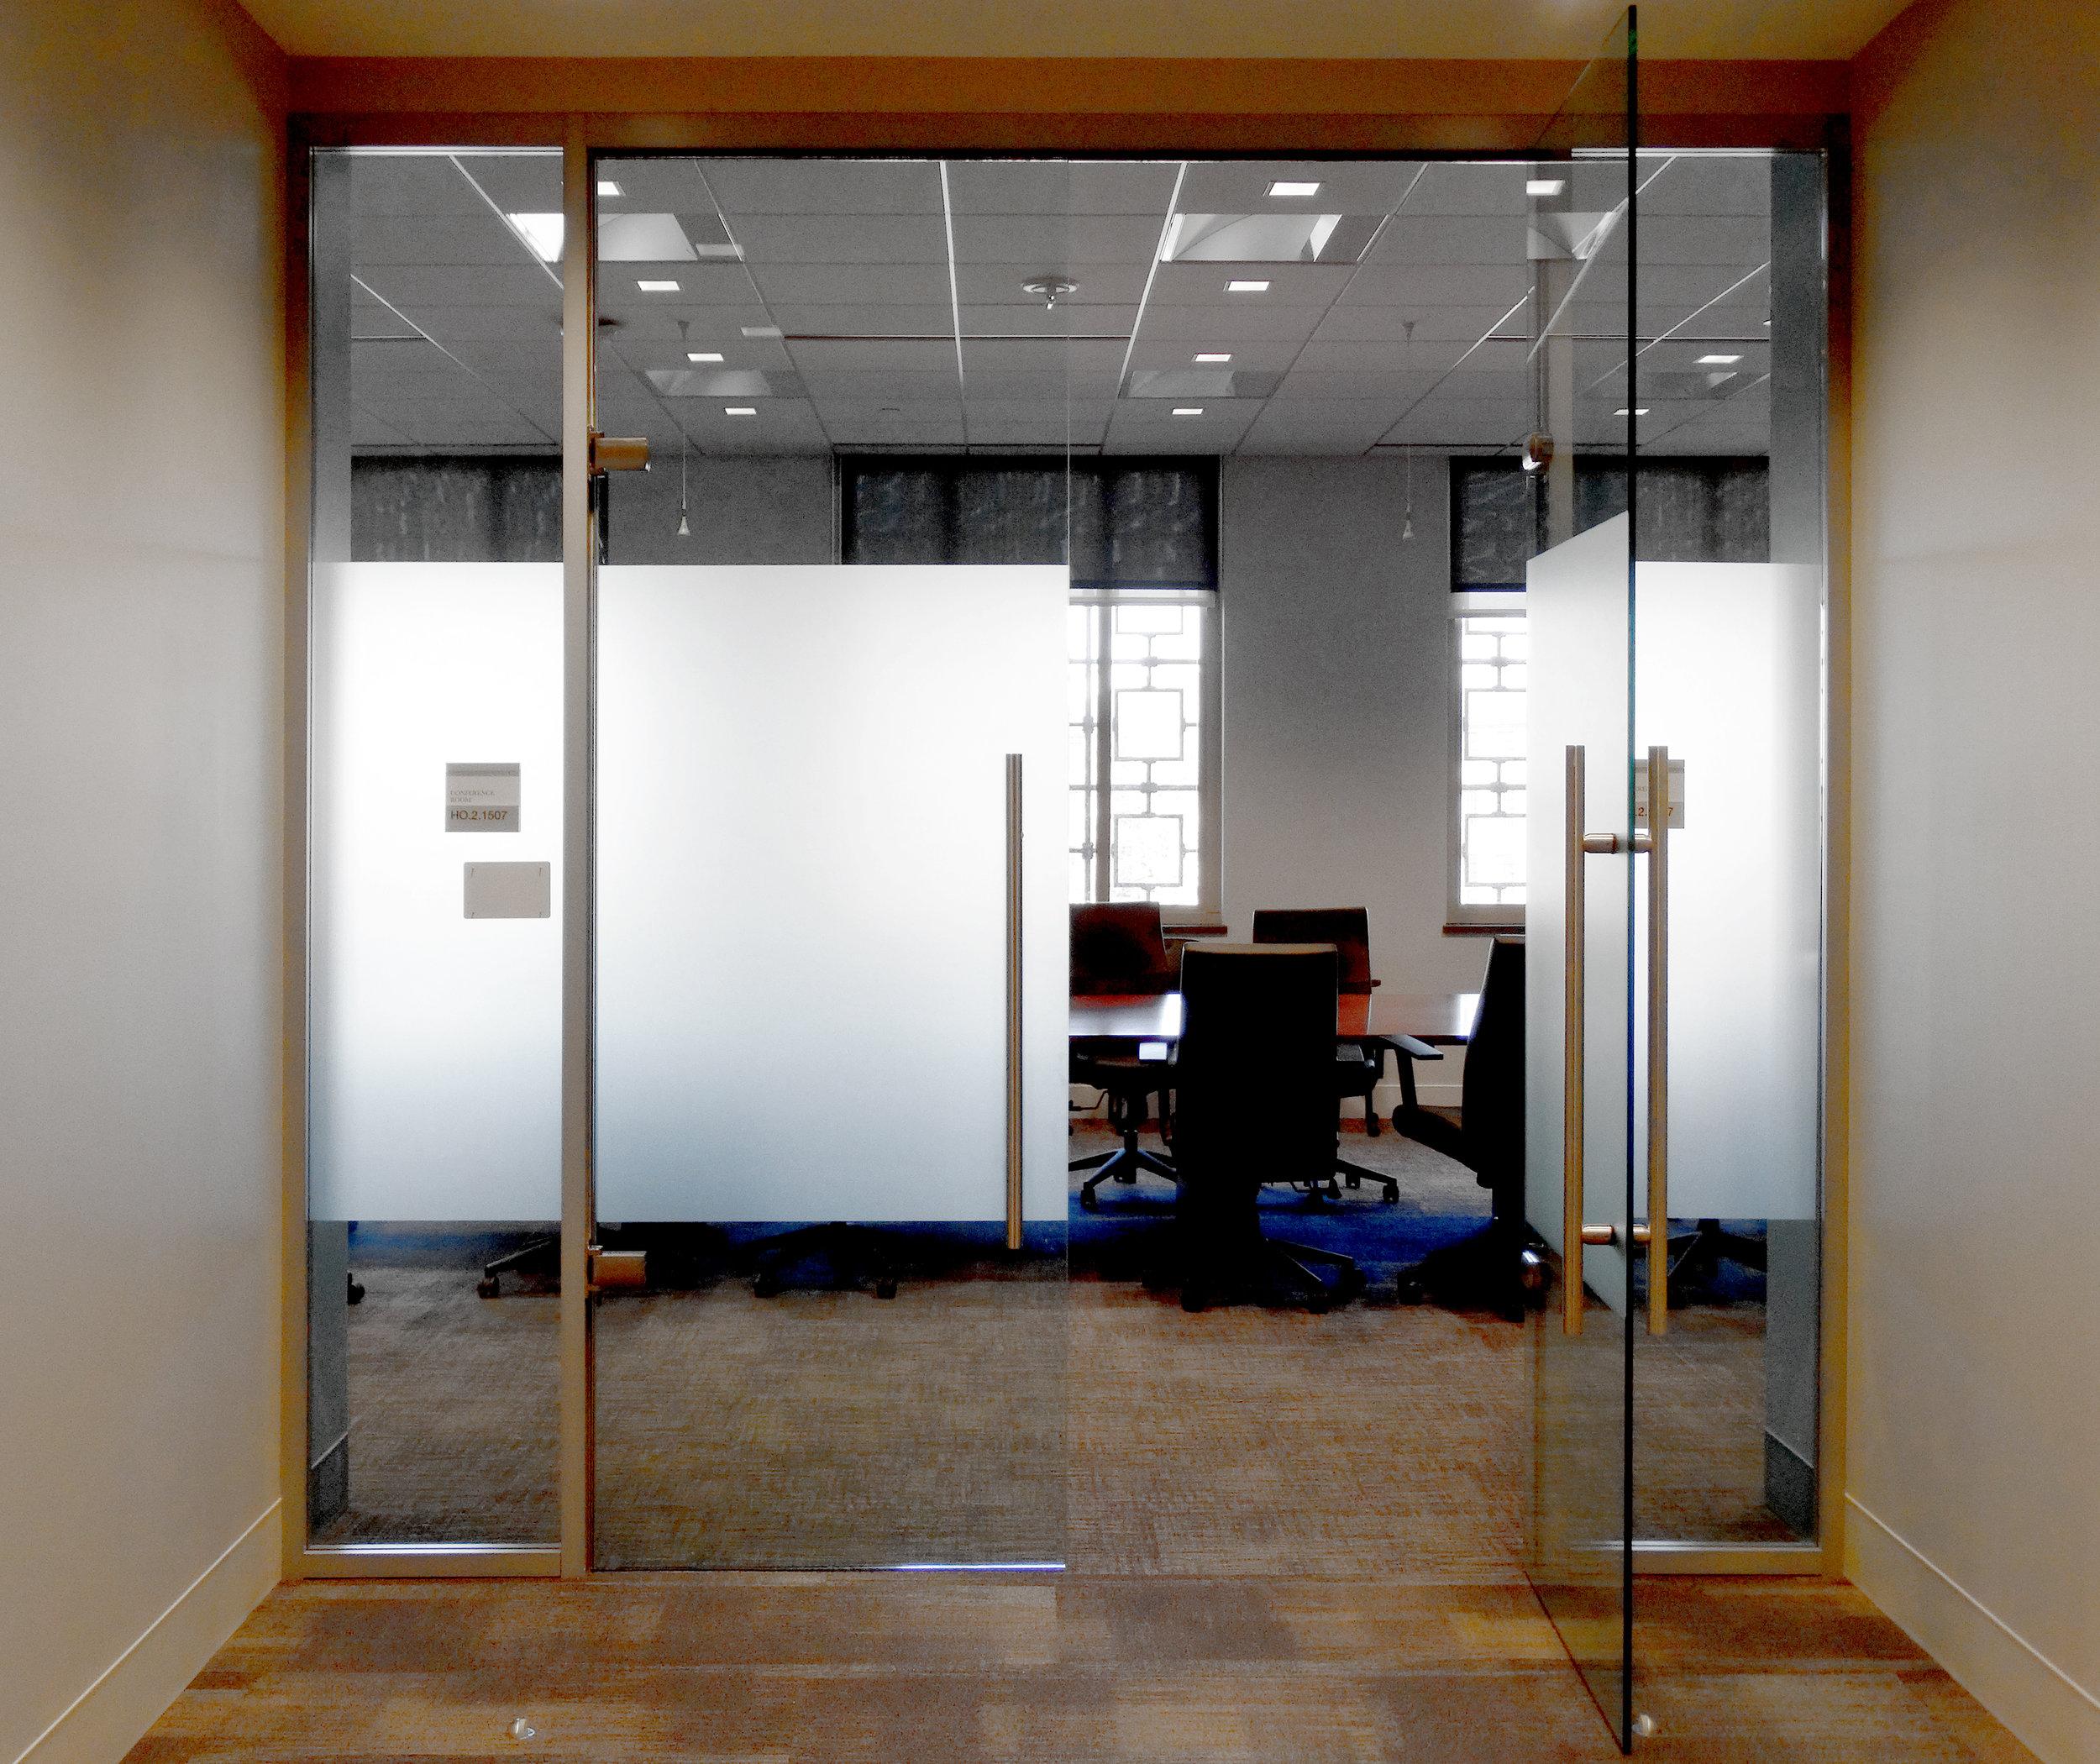 Litespace Frameless Glass Double Door Glass Wall - Spaceworks AI.jpg